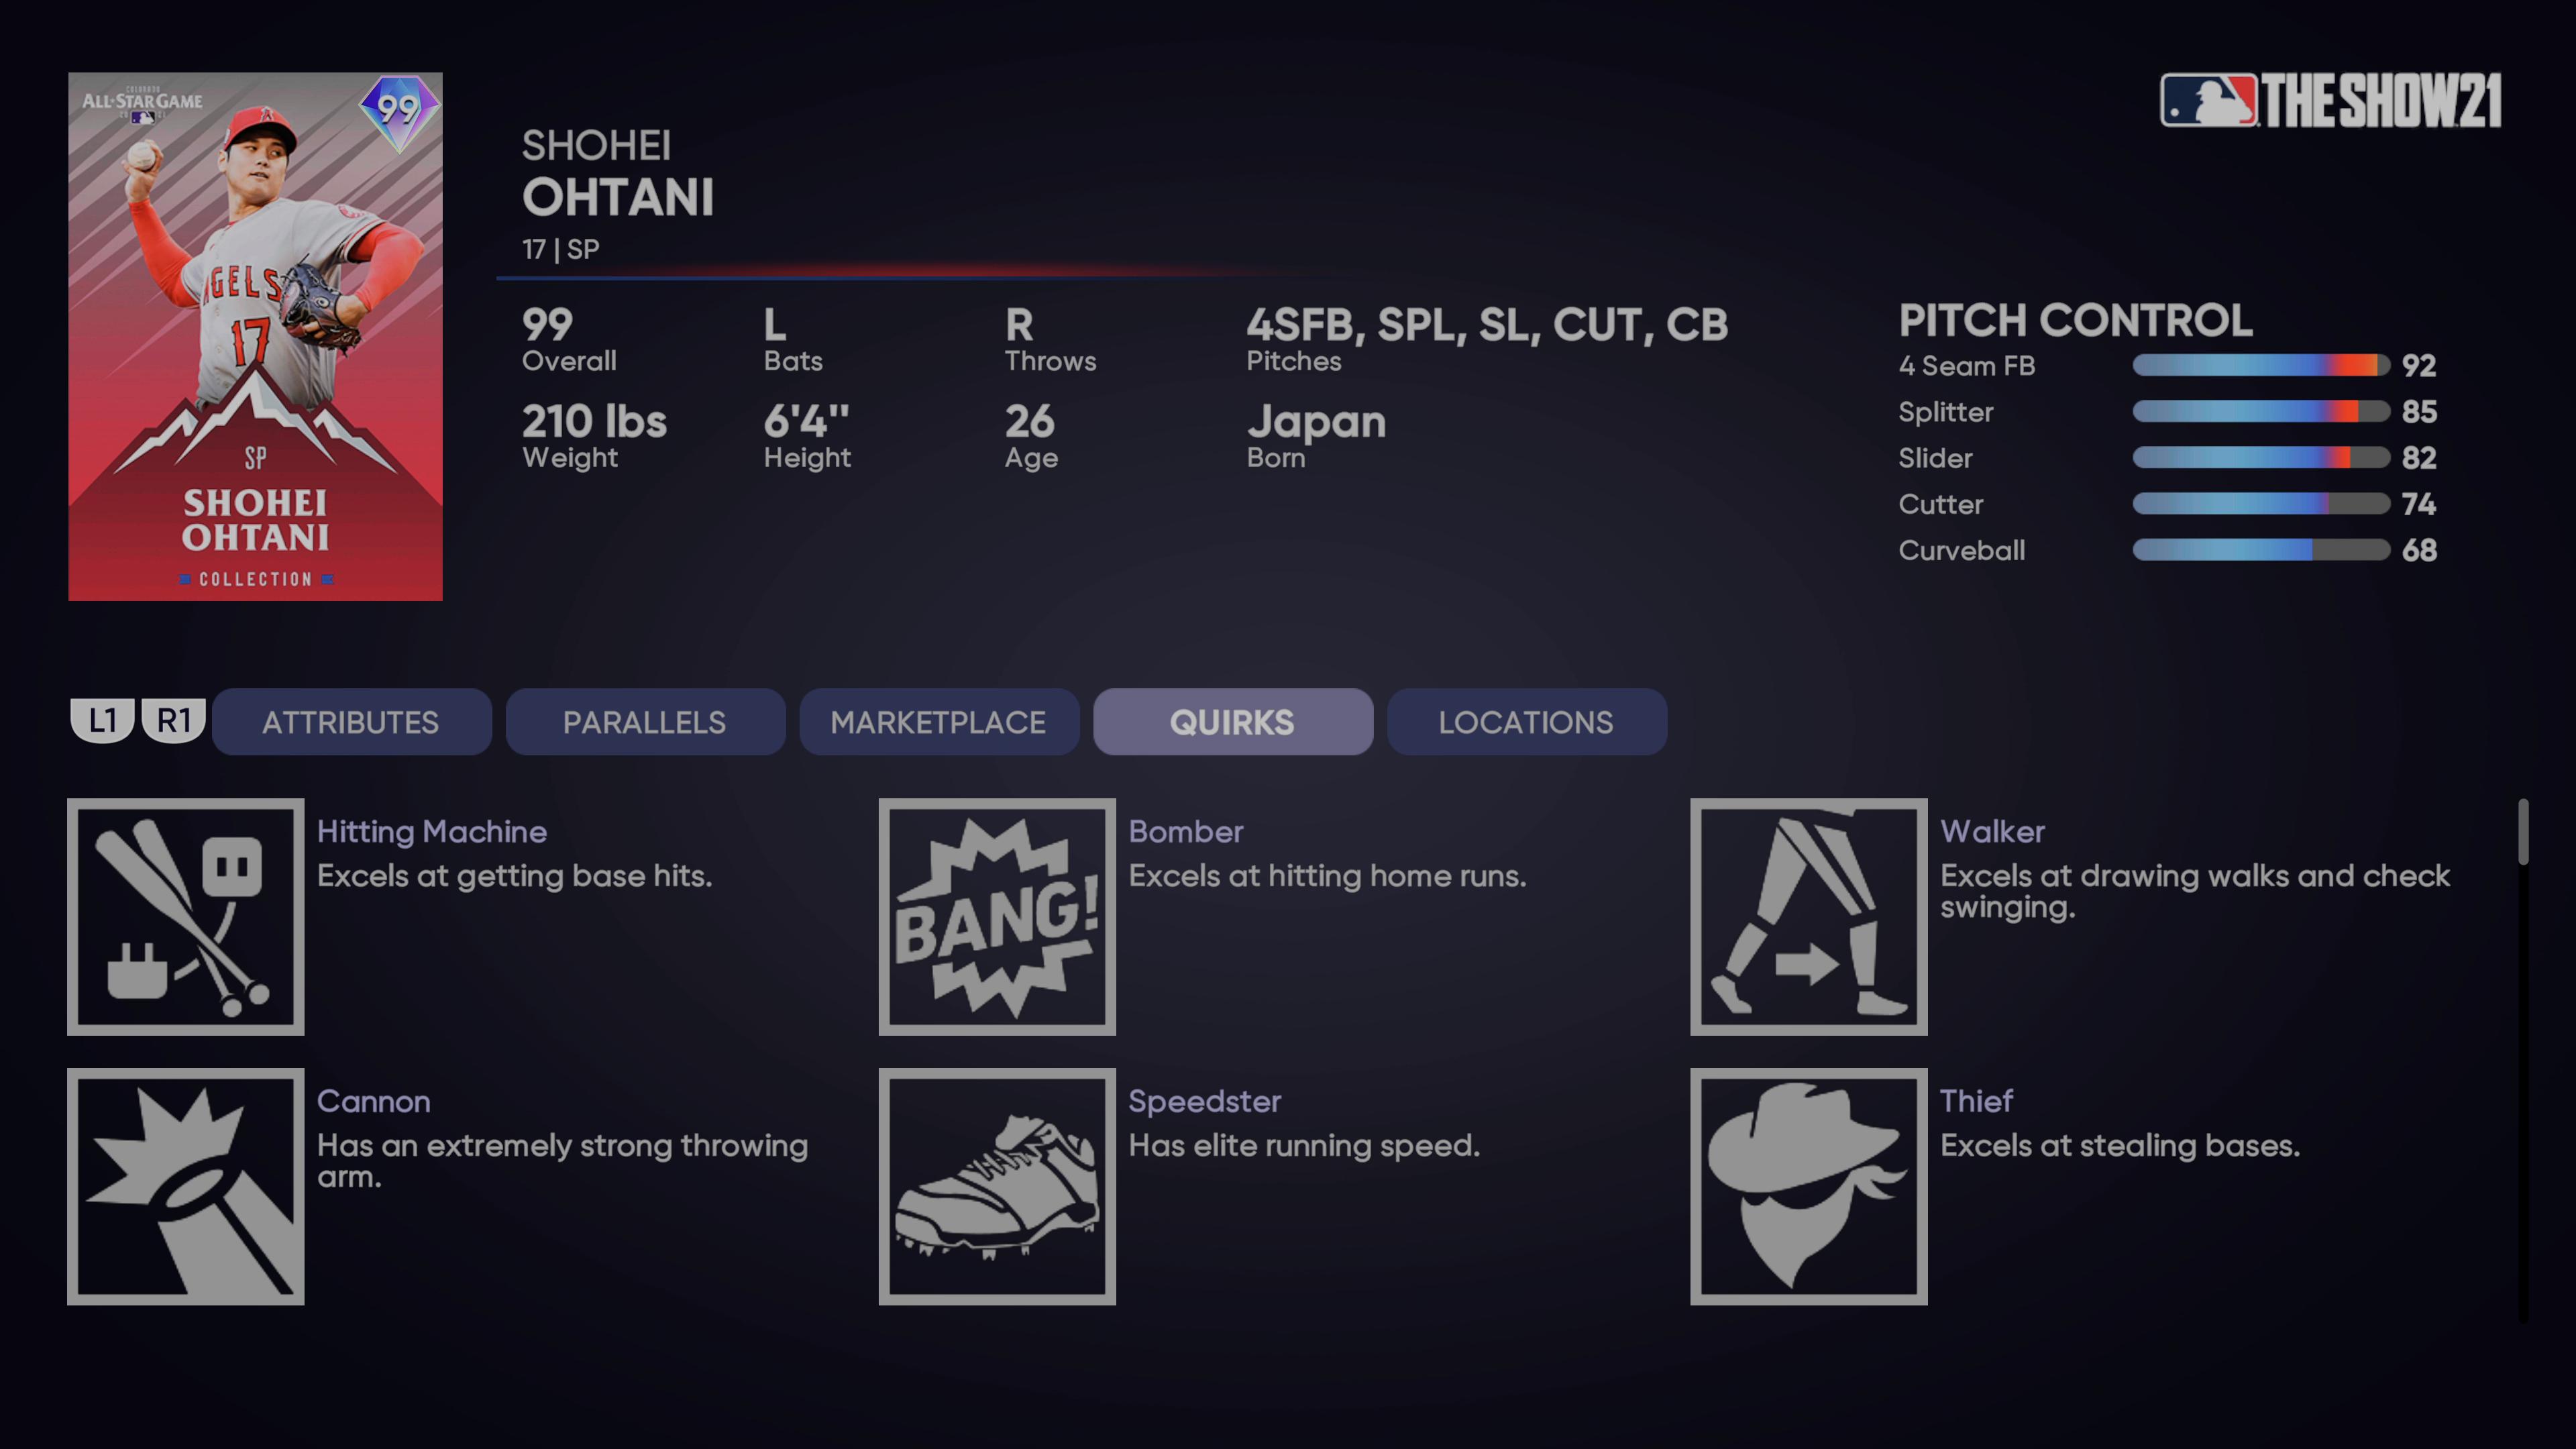 MLB The Show 21 - Home Run Derby_2021-07-13_02-07-50